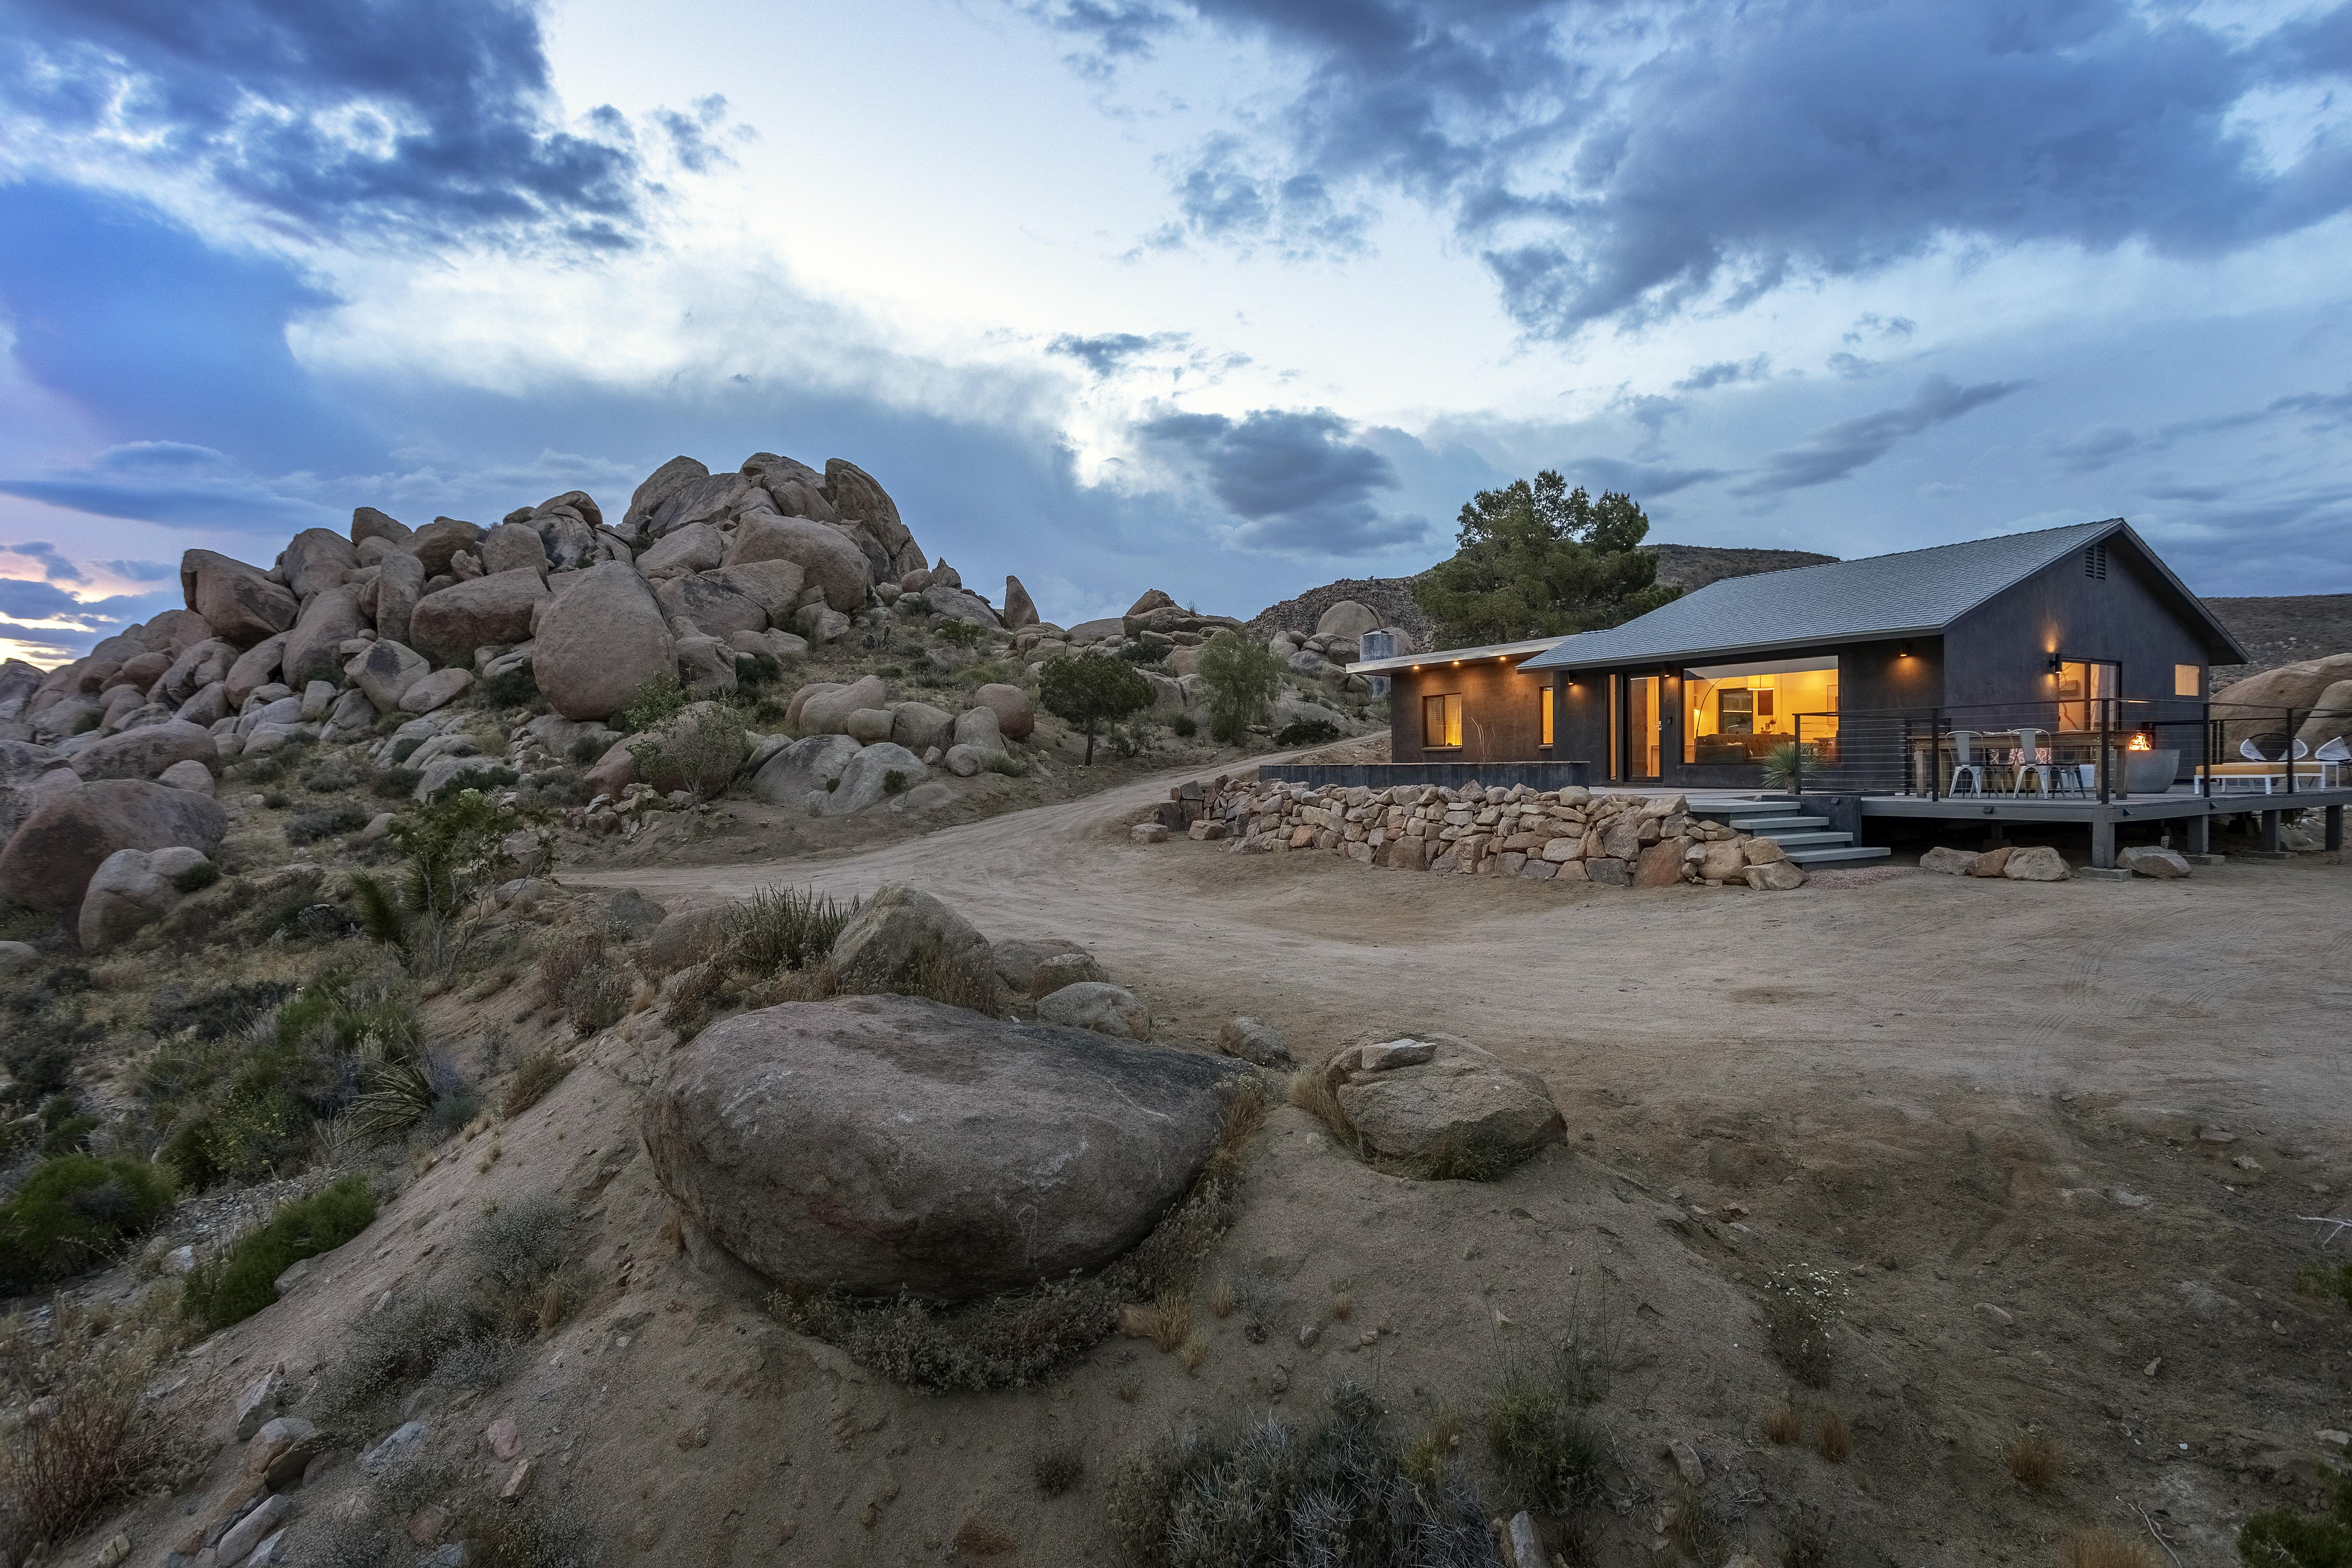 Dakota Haus Hot Tub Cowboy Tub Epic Boulders Houses For Rent In Pioneertown California United States